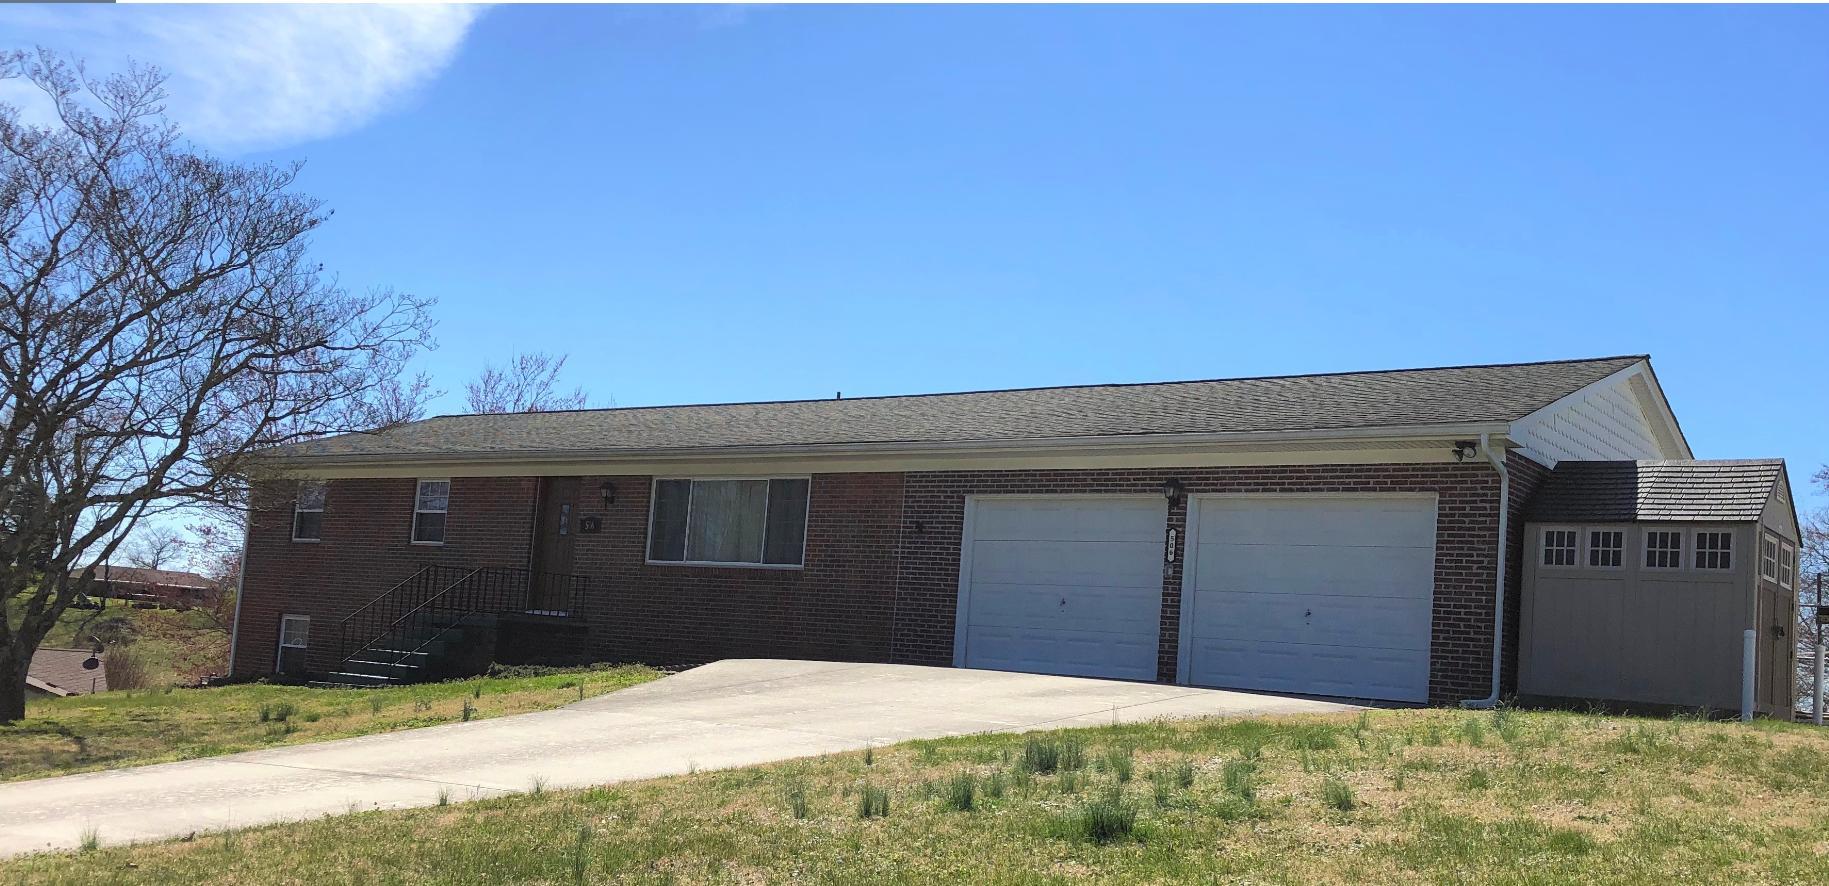 506 Westbury Drive, Clinton, Tennessee 37716, 3 Bedrooms Bedrooms, ,2 BathroomsBathrooms,Single Family,For Sale,Westbury,1073965